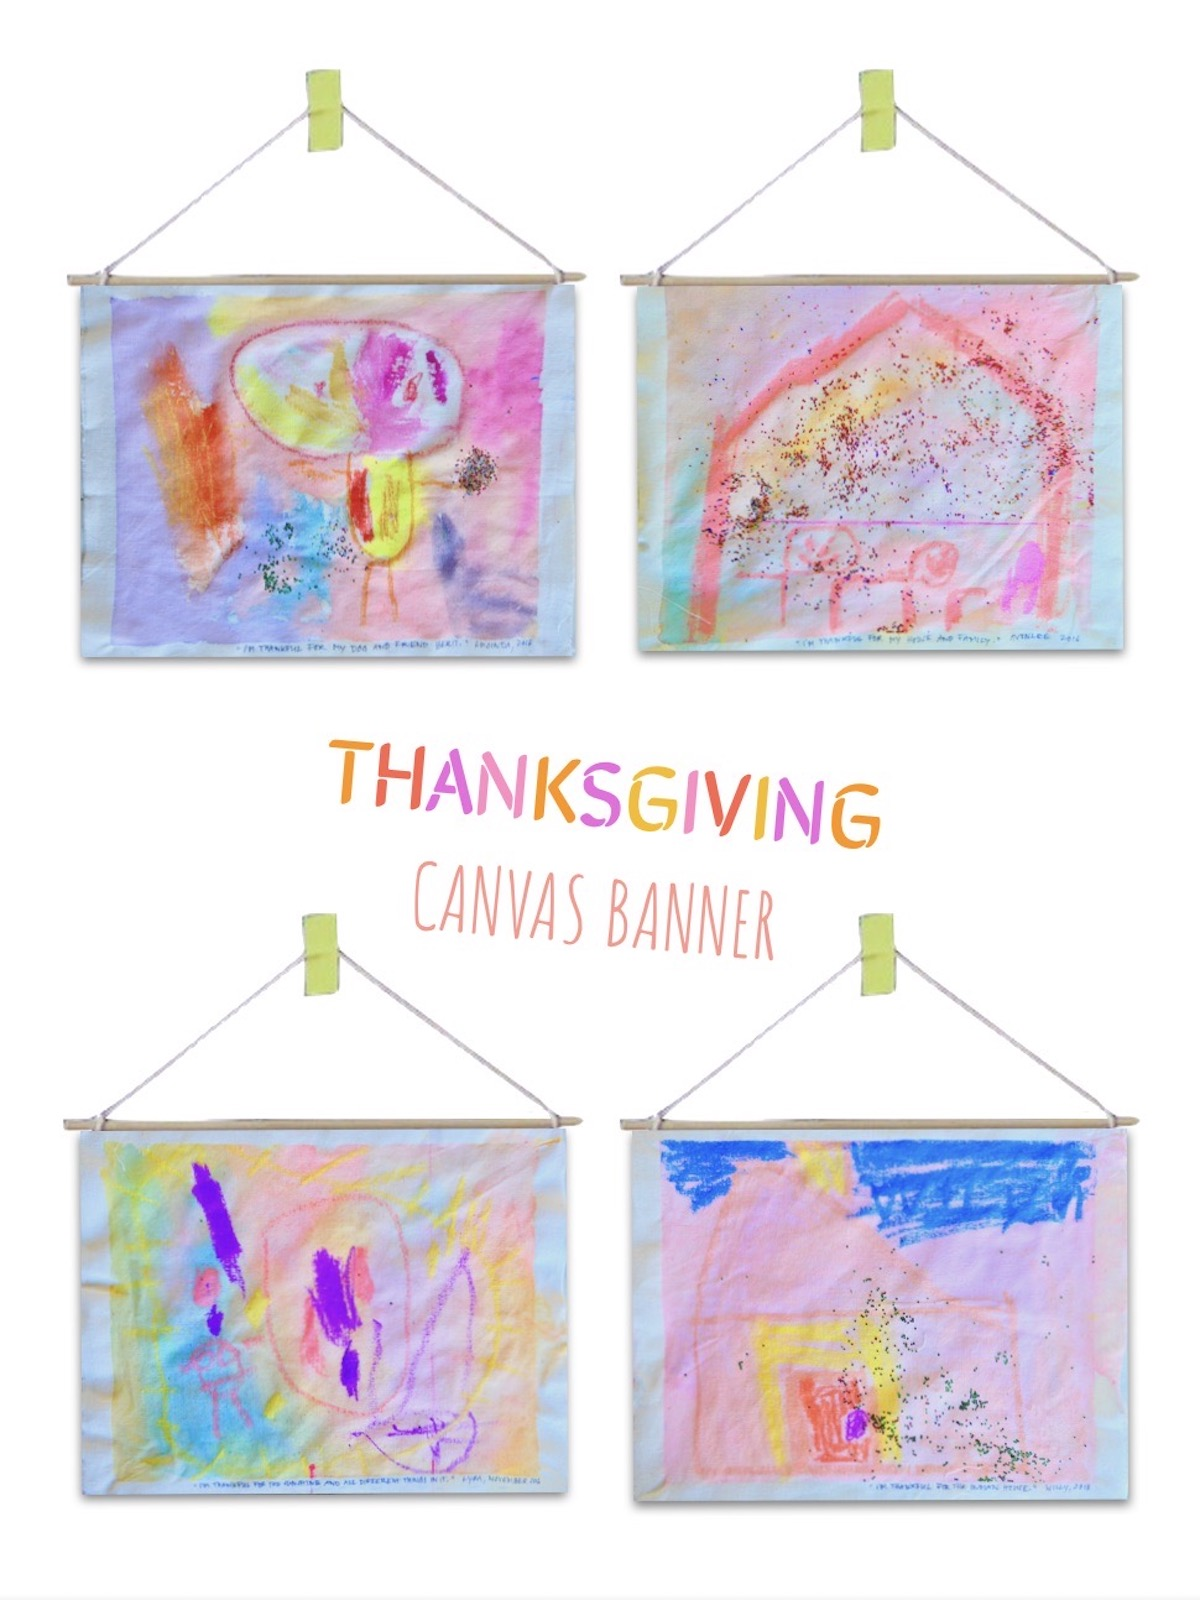 Thanksgiving Canvas Banner